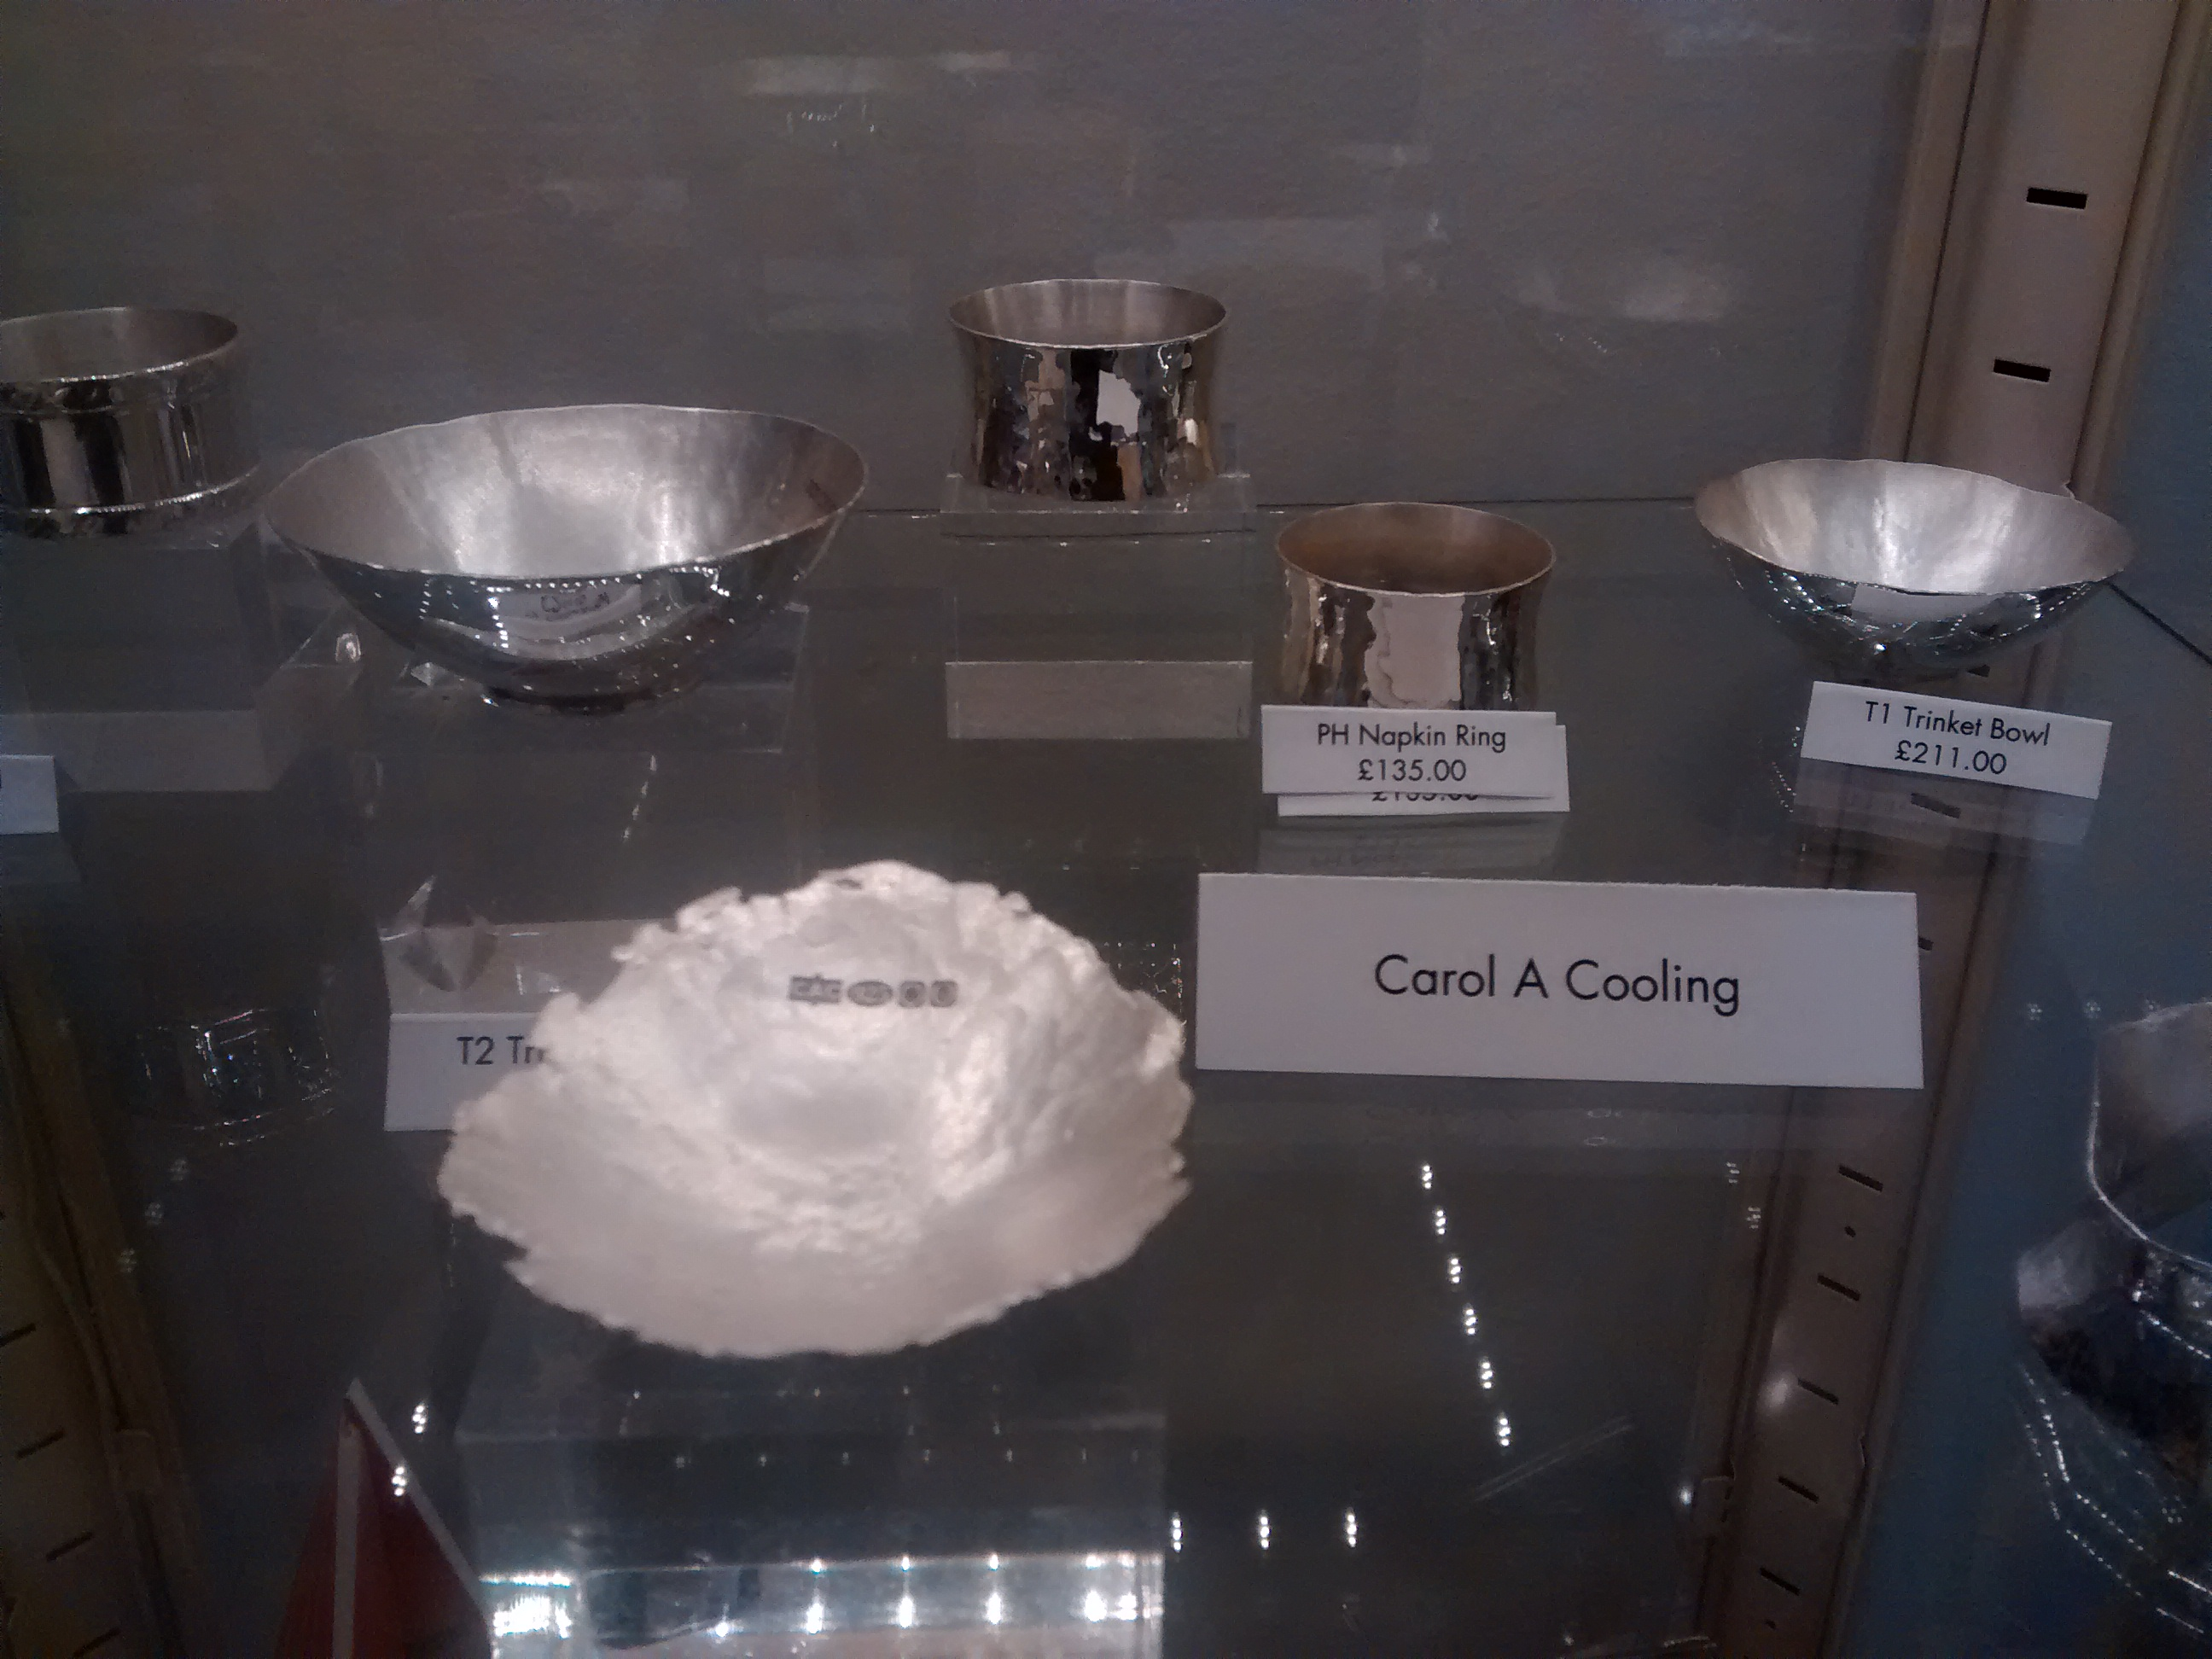 sheffield millenium gallery display 2014